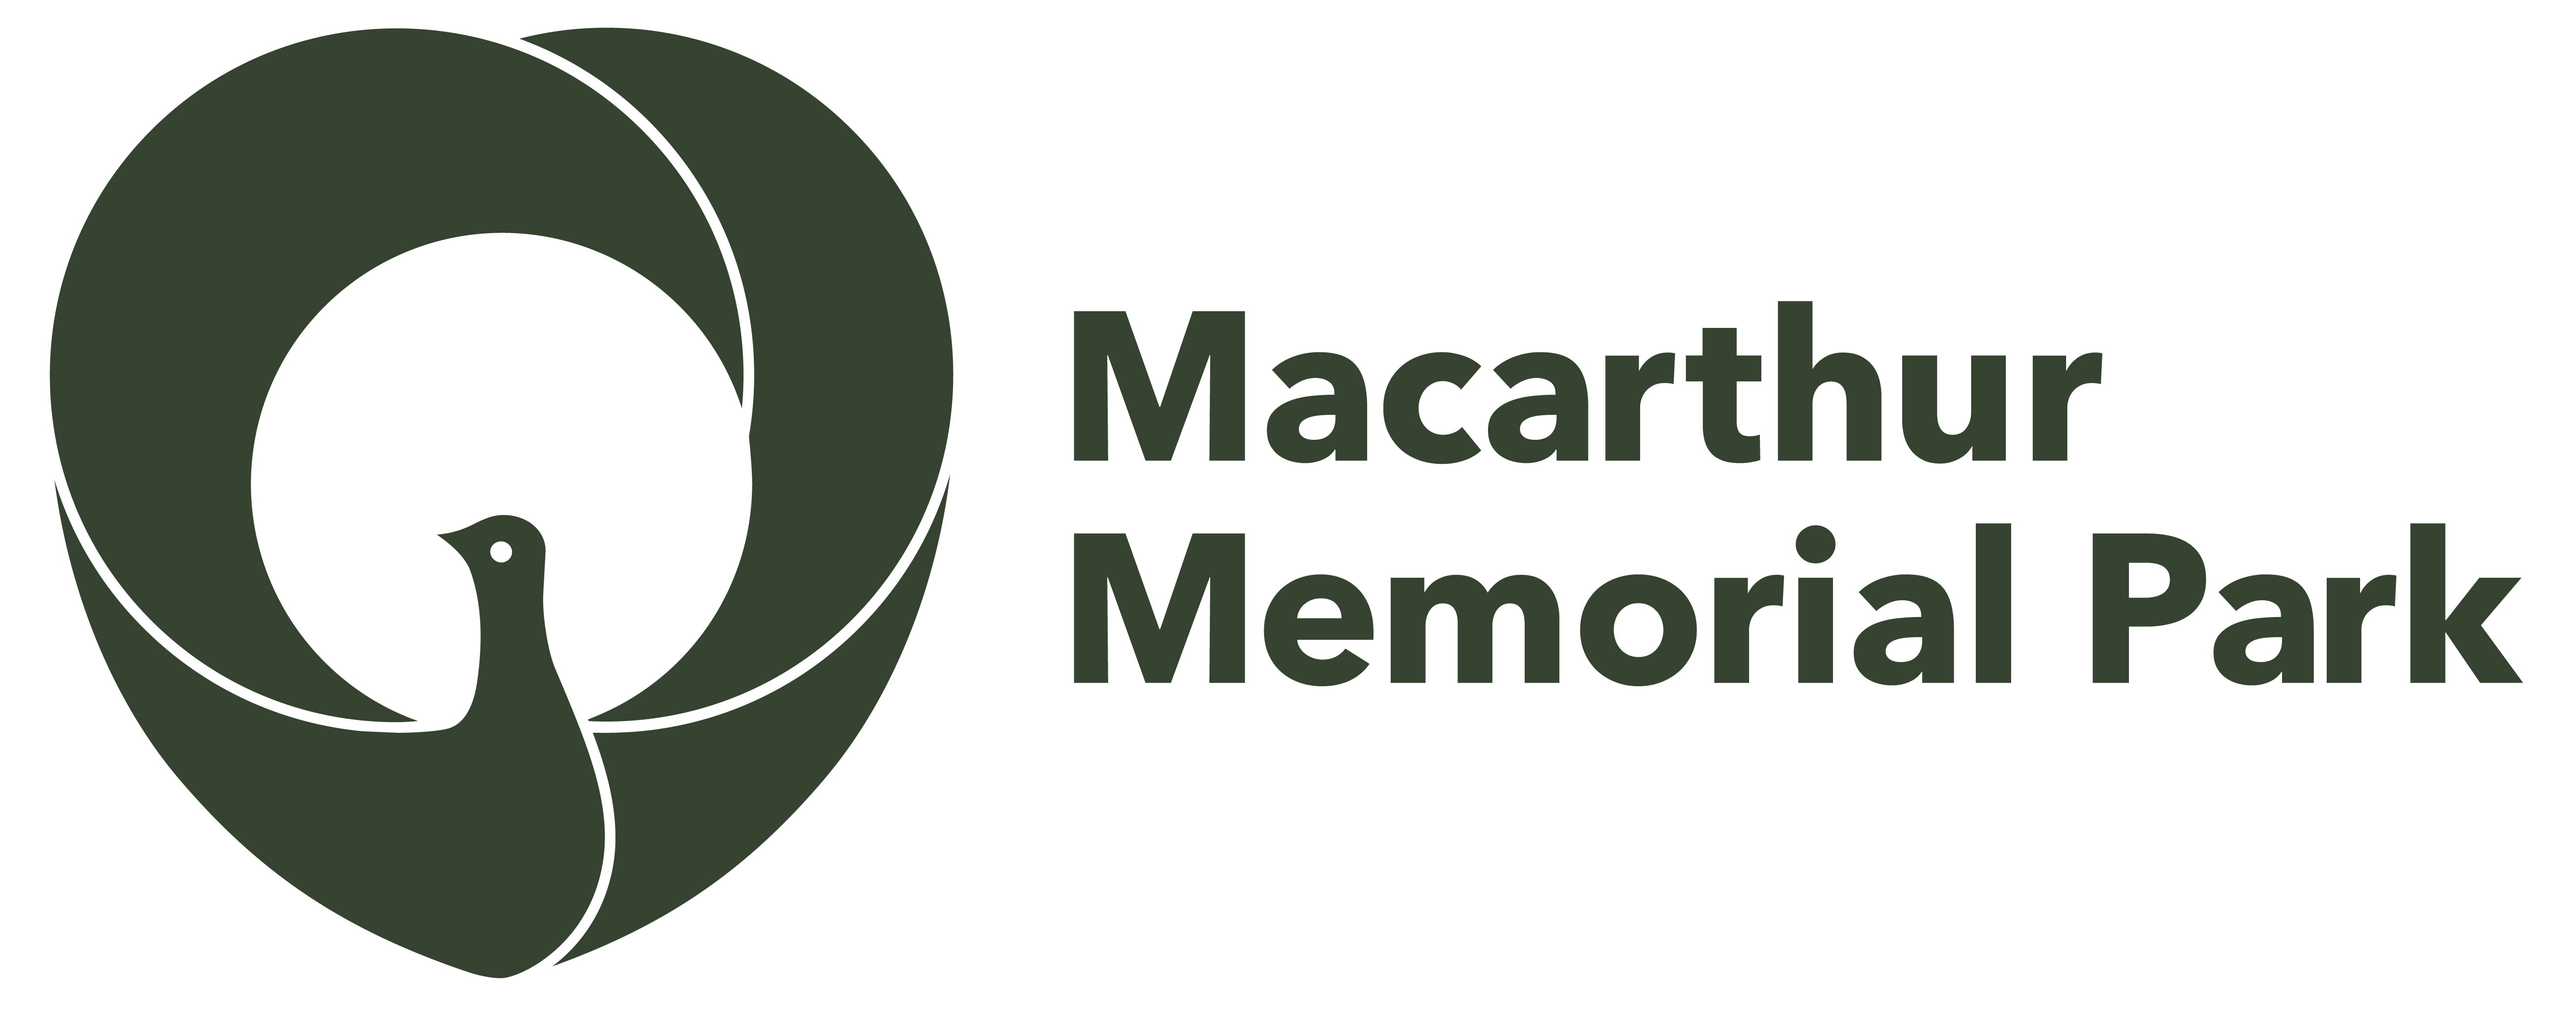 Macarthur Memorial Park